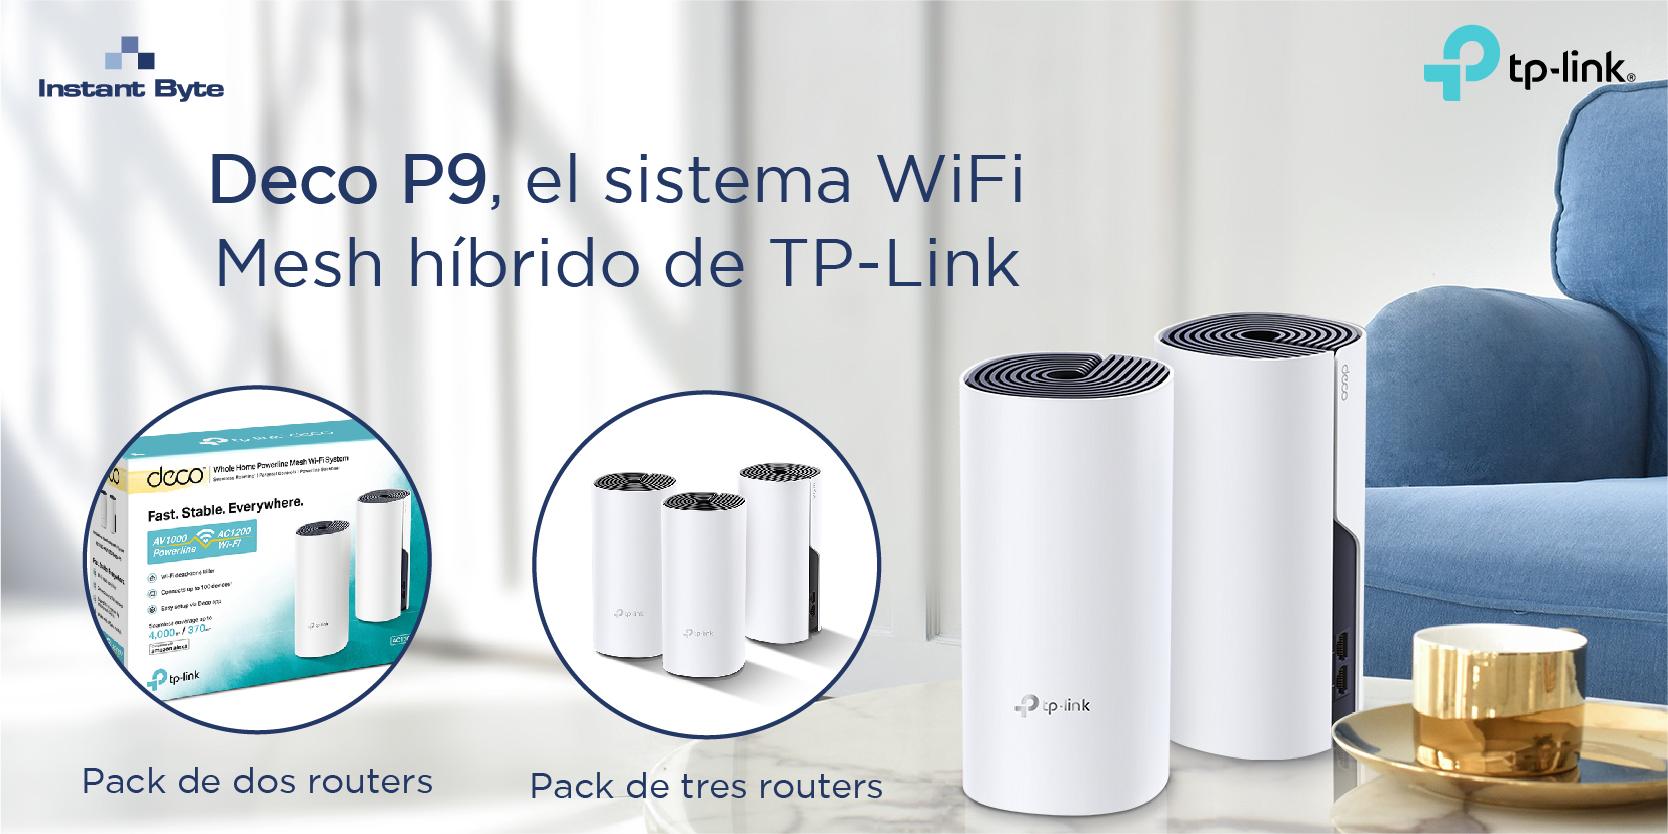 Deco P9 de TP-Link, el sistema WiFi Mesh híbrido para cubrir grandes superficies